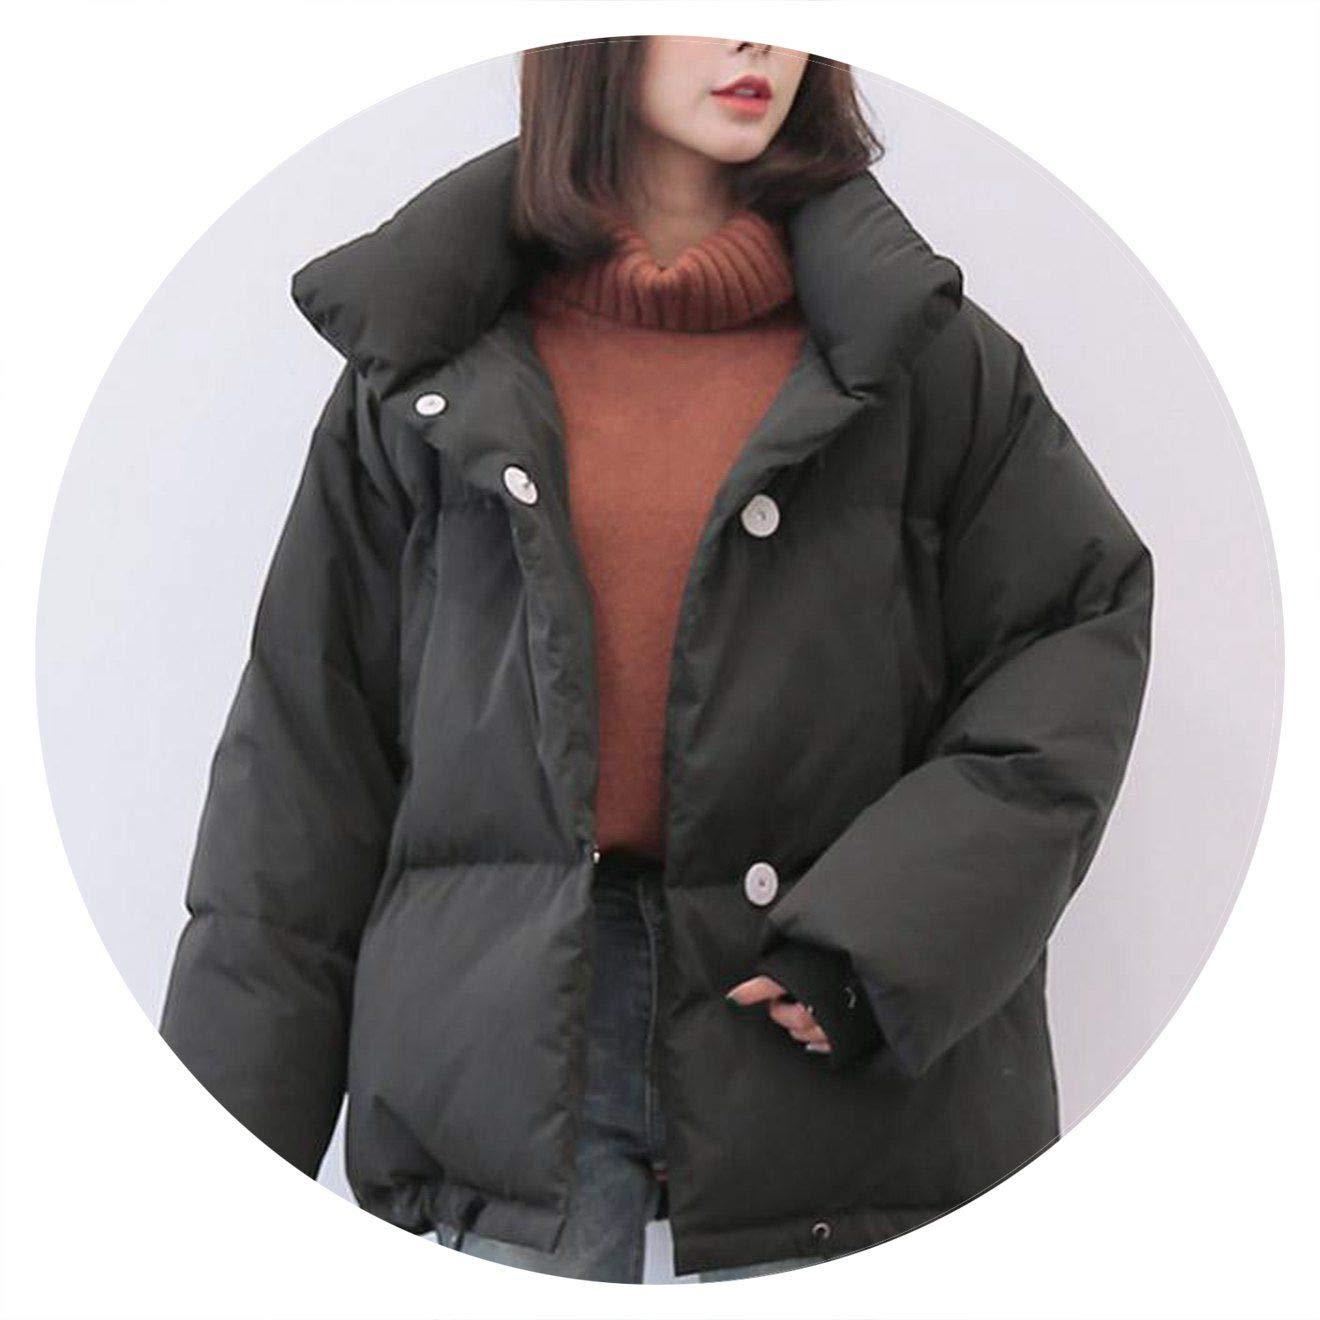 Black Jifnhtrs Winter Jacket Coats 90% Duck Down Parkas Loose Warm Snow Short Outwear Female Stand Collar Overcoat